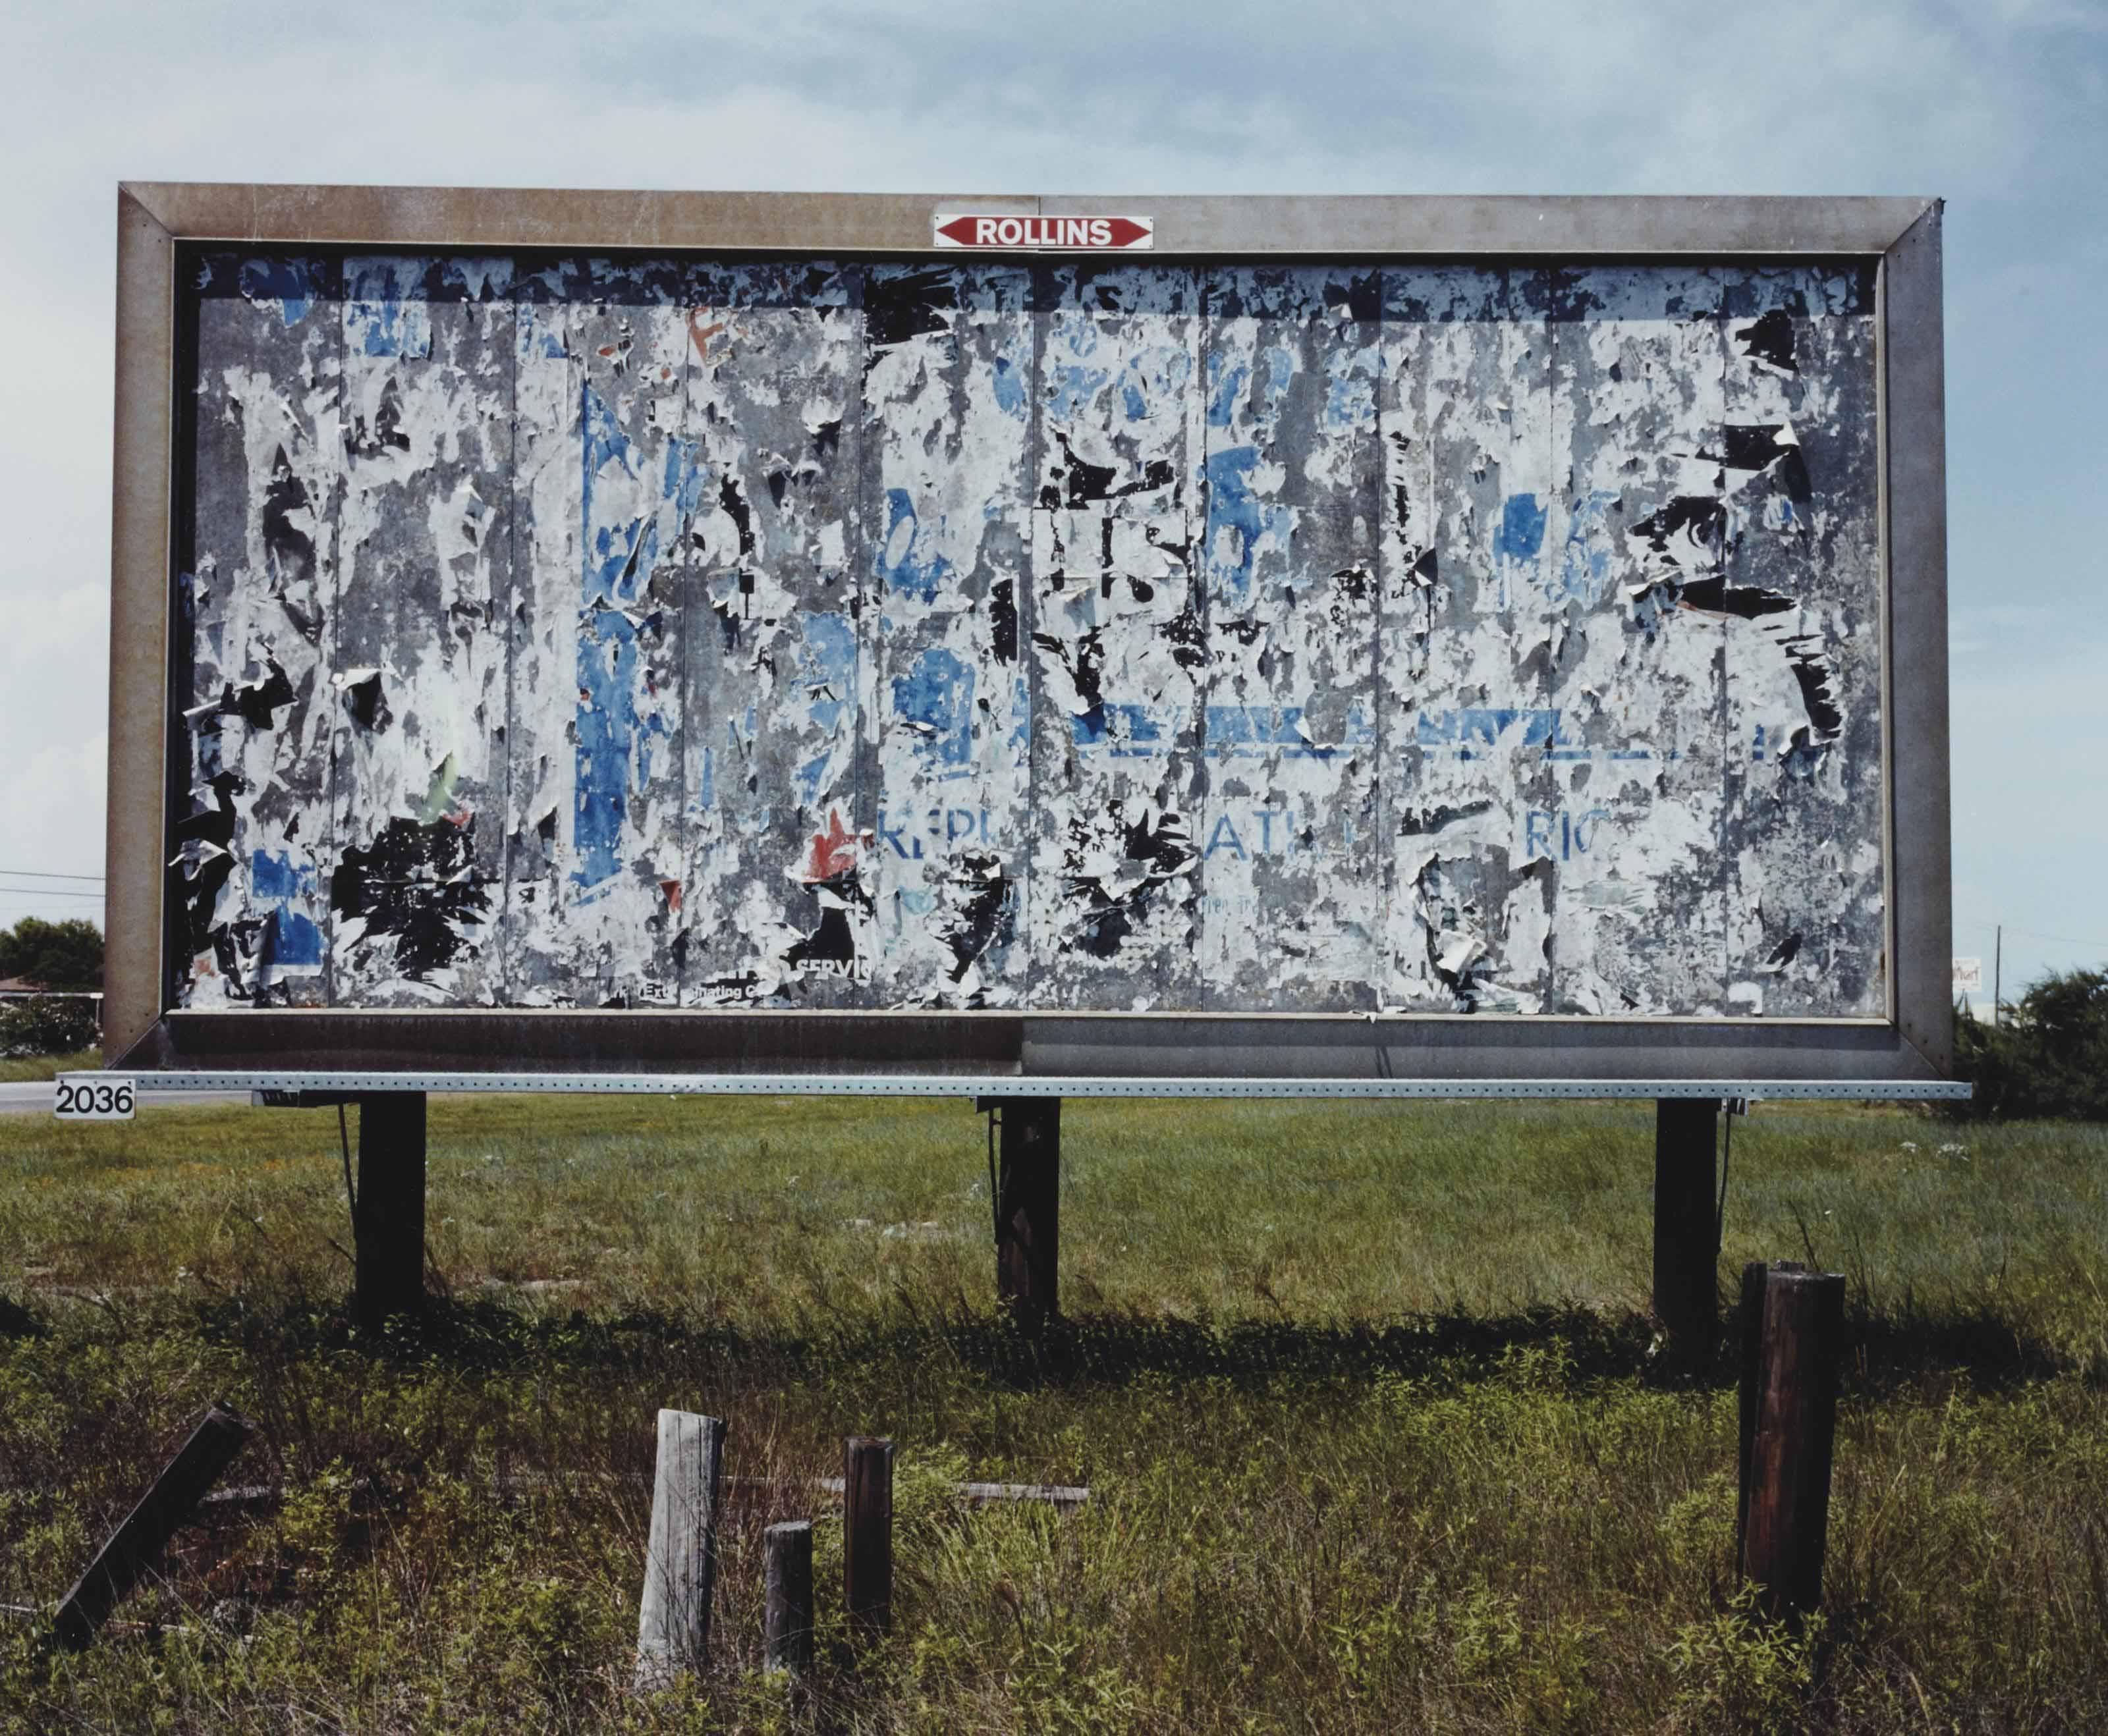 2036, Arkansas Pass, Texas, 1983